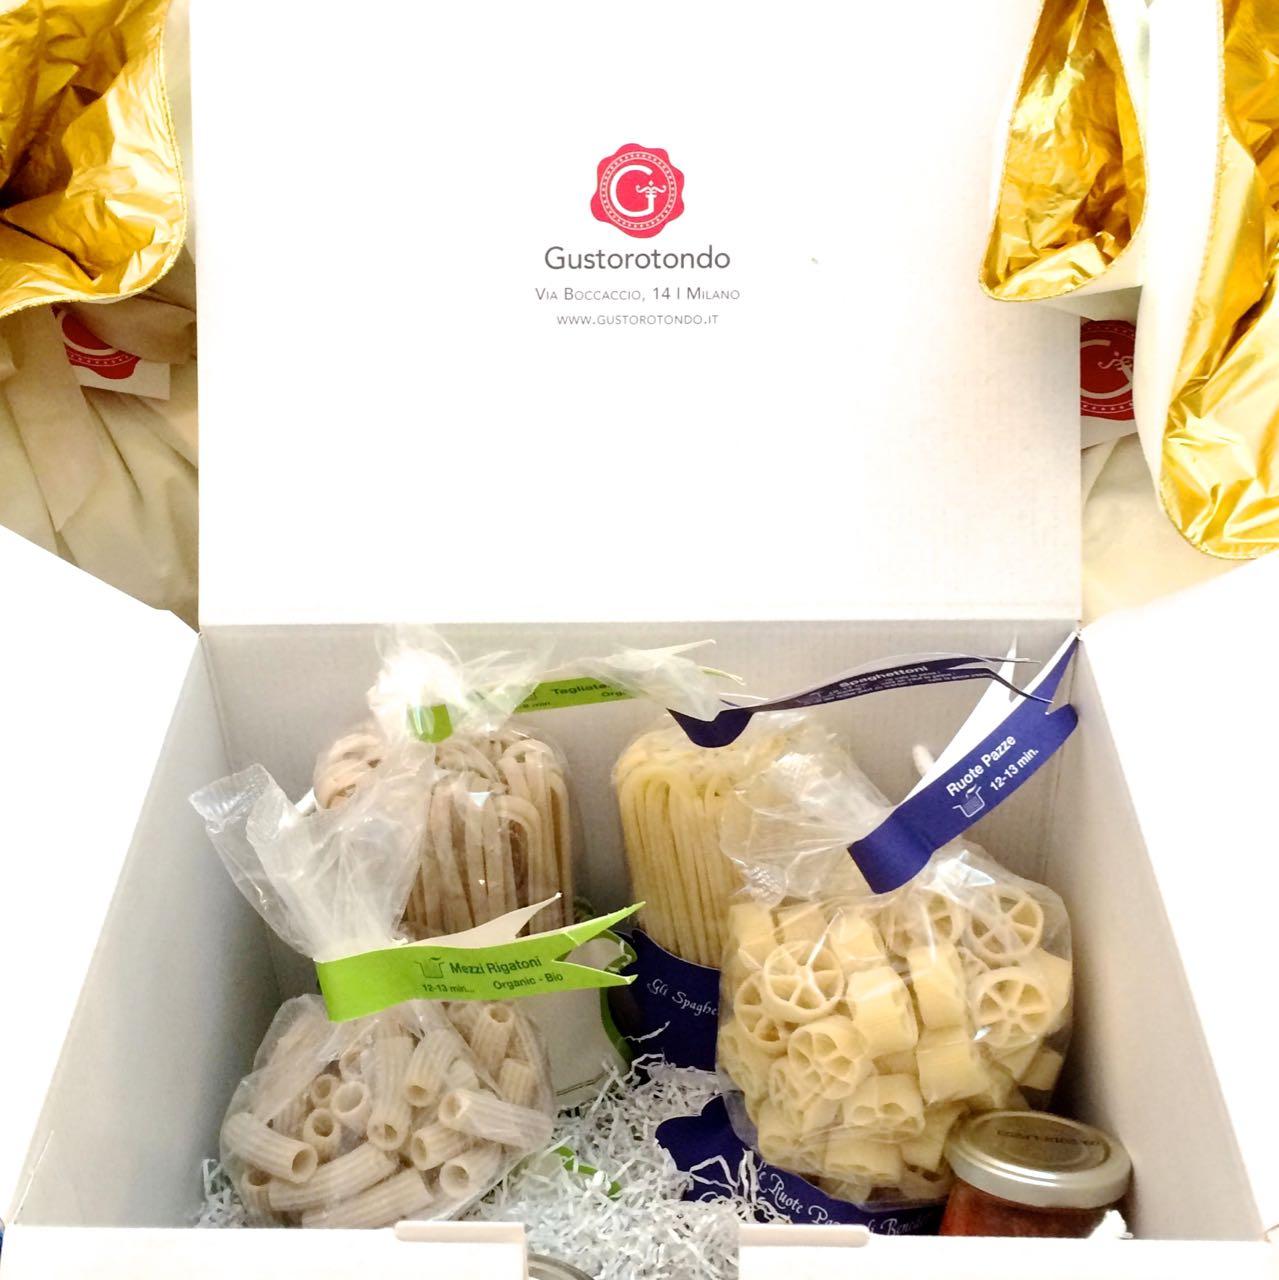 Confezione regalo Gustorotondo apertura esempio – Gustorotondo Gift Box opening example – Confezione regalo Gustorotondo – Gustorotondo Italian food boutique – I migliori cibi online – Best Italian foods online – spesa online